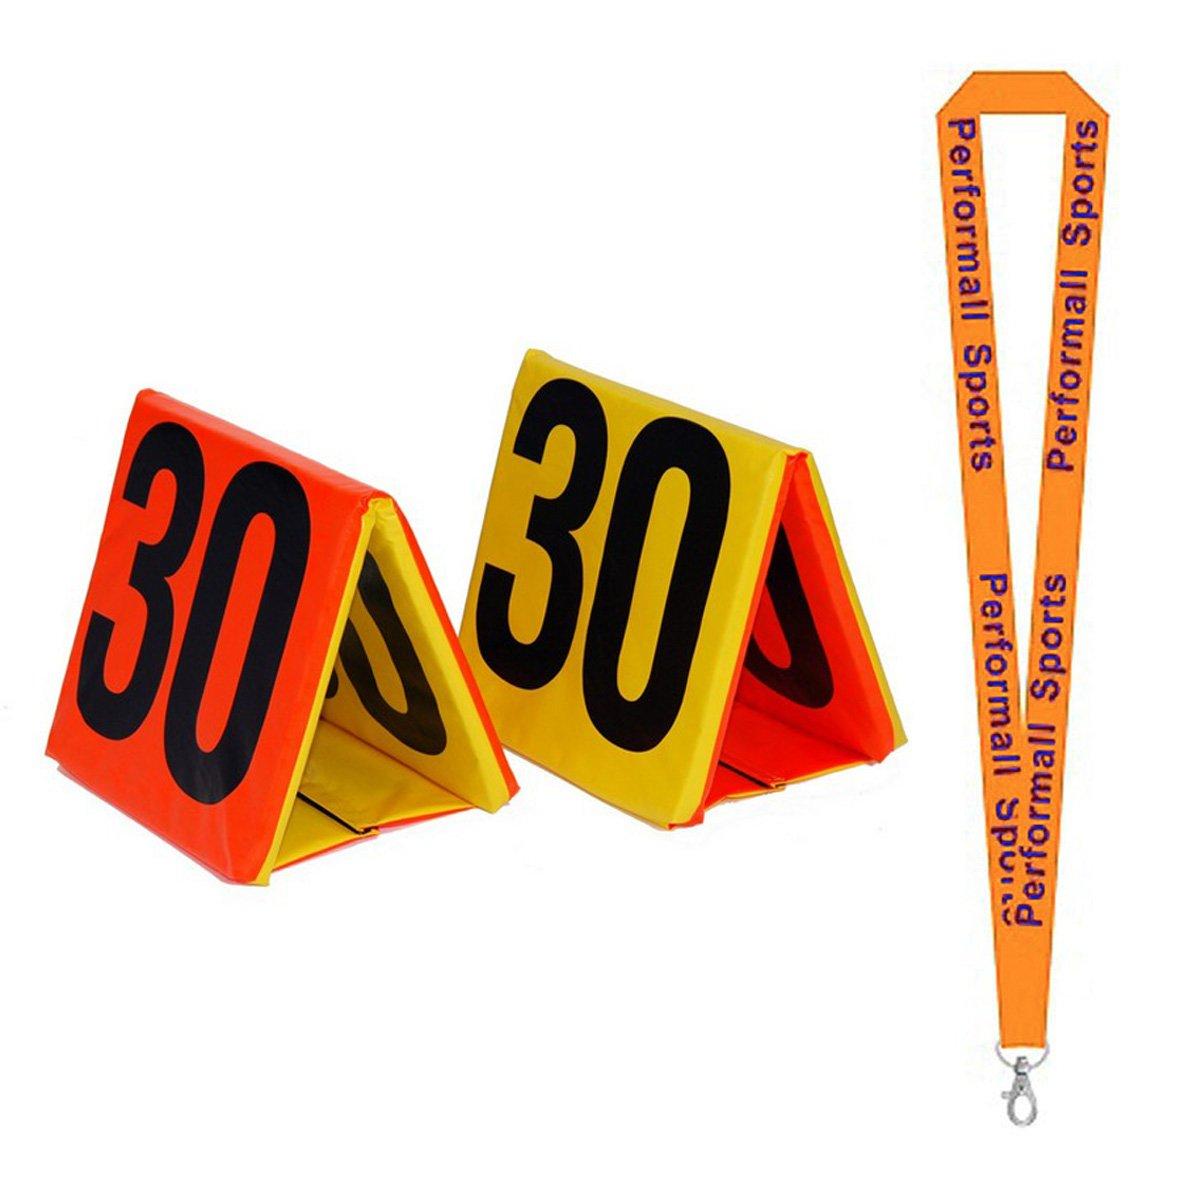 Champion Sports Day-Night Sideline Marker Set Yellow/Orange/Black (Set of 11) with 1 Performall Lanyard SLMSET-1P